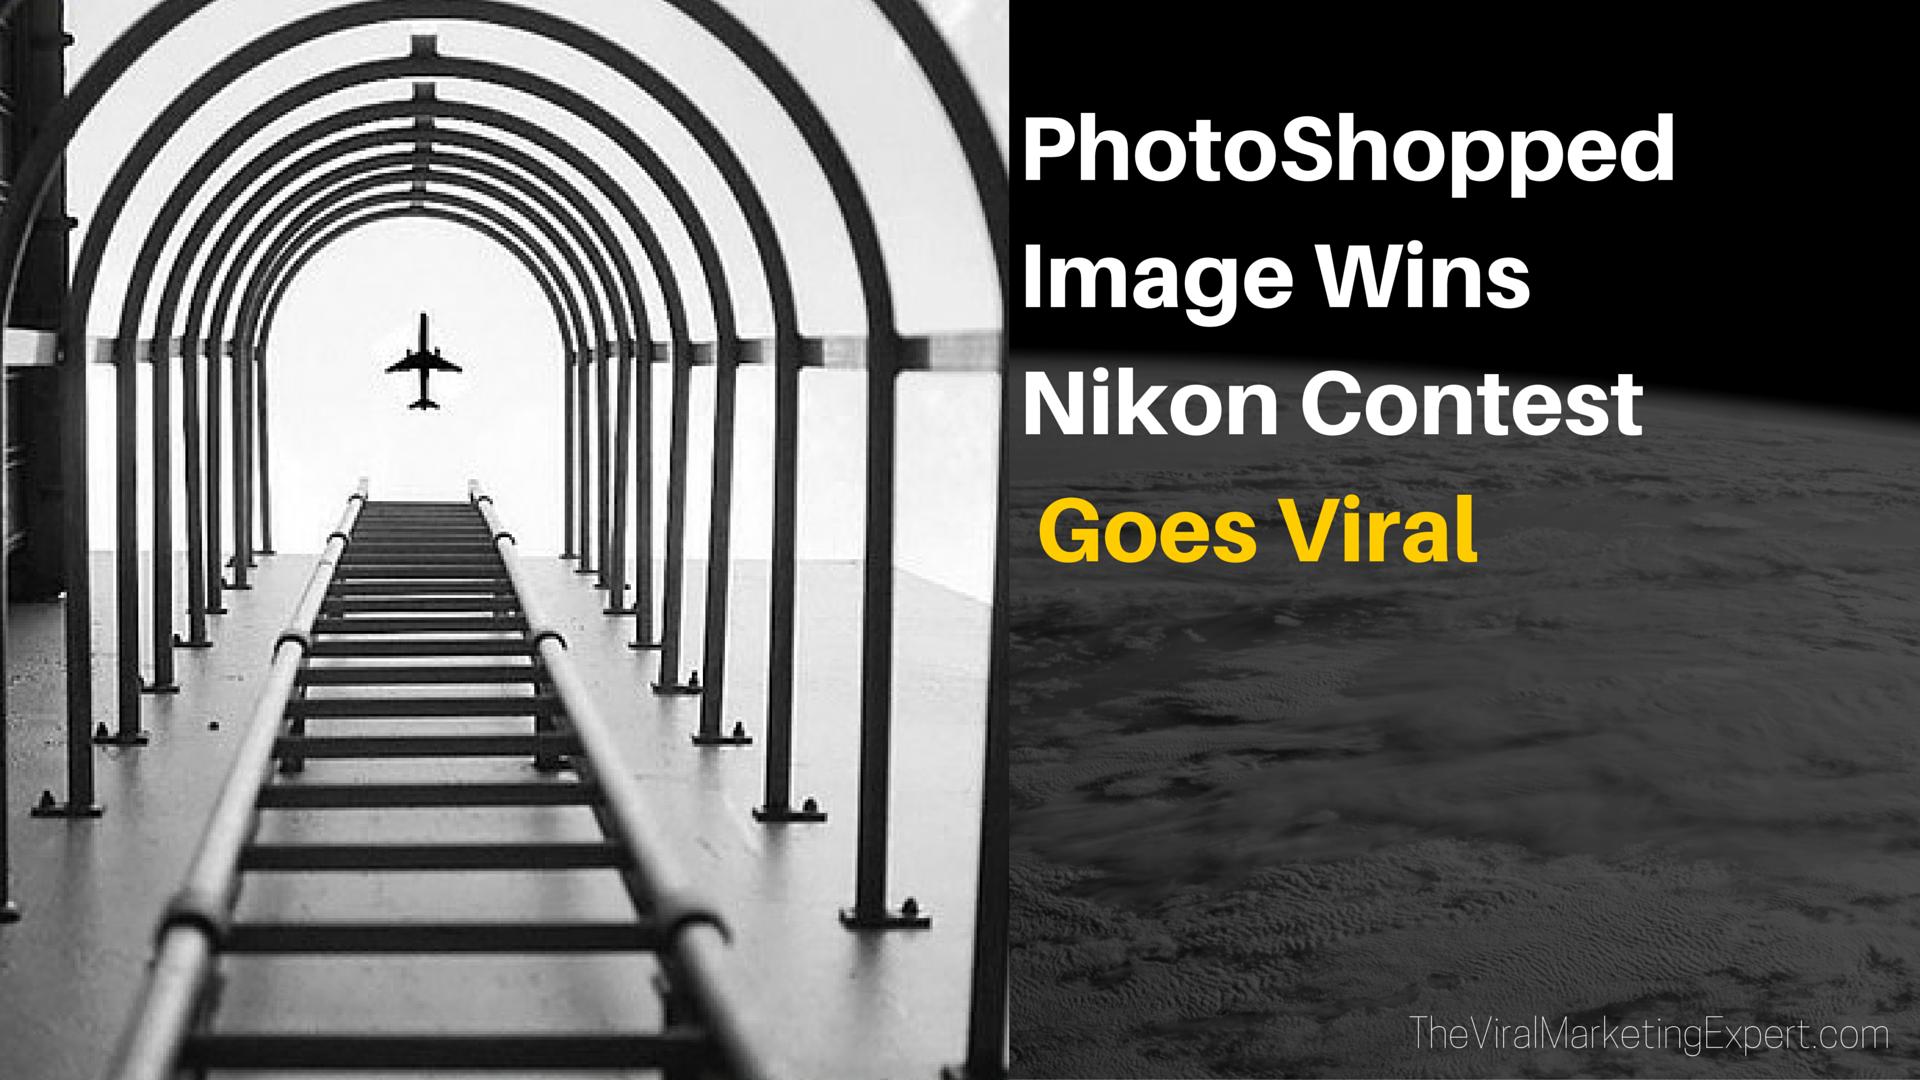 Nikon contest